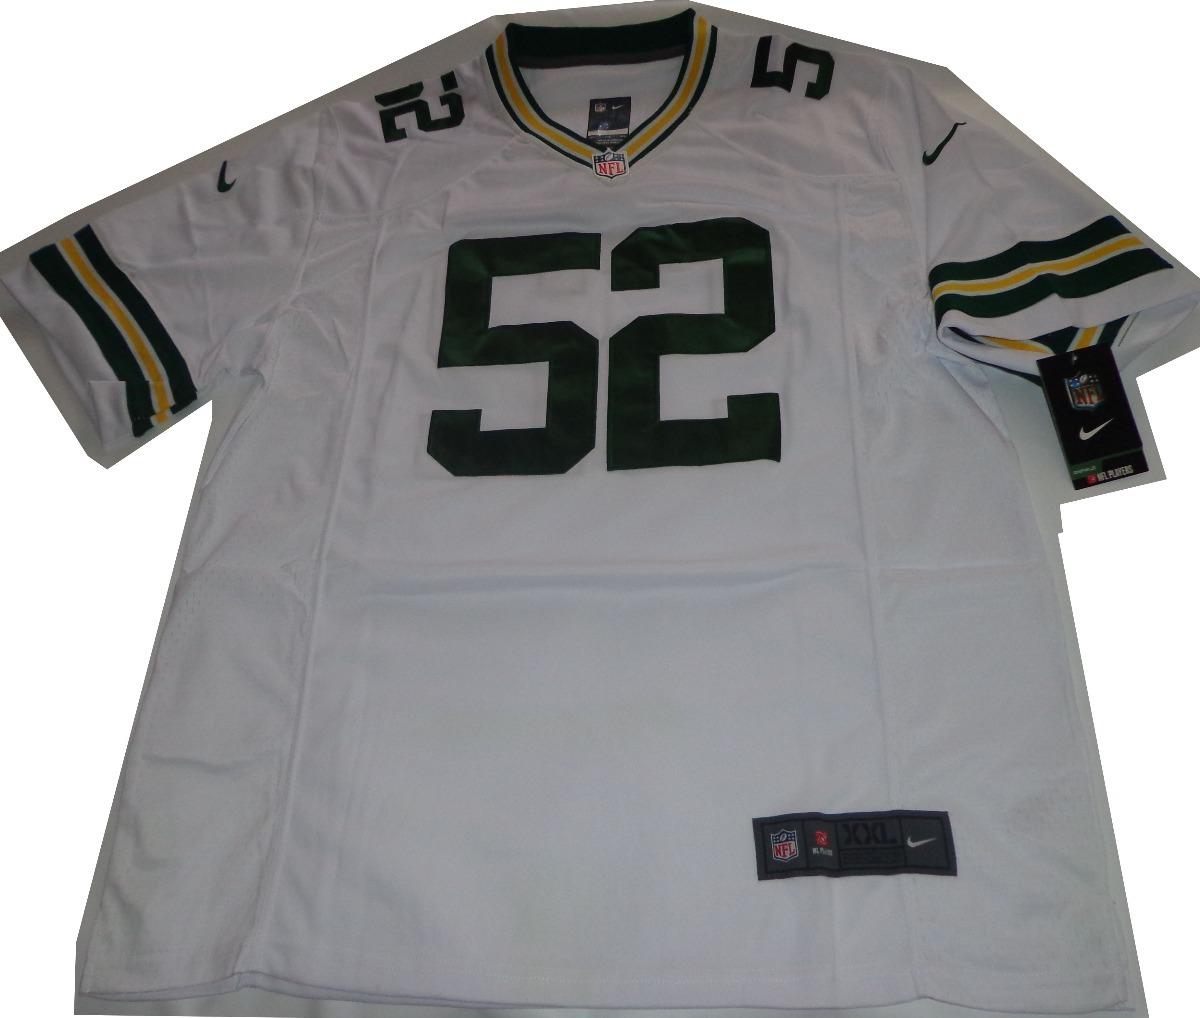 camiseta futbol americano green bay packers nike 2xl nfl usa. Cargando zoom. c45dcfbdd7c46